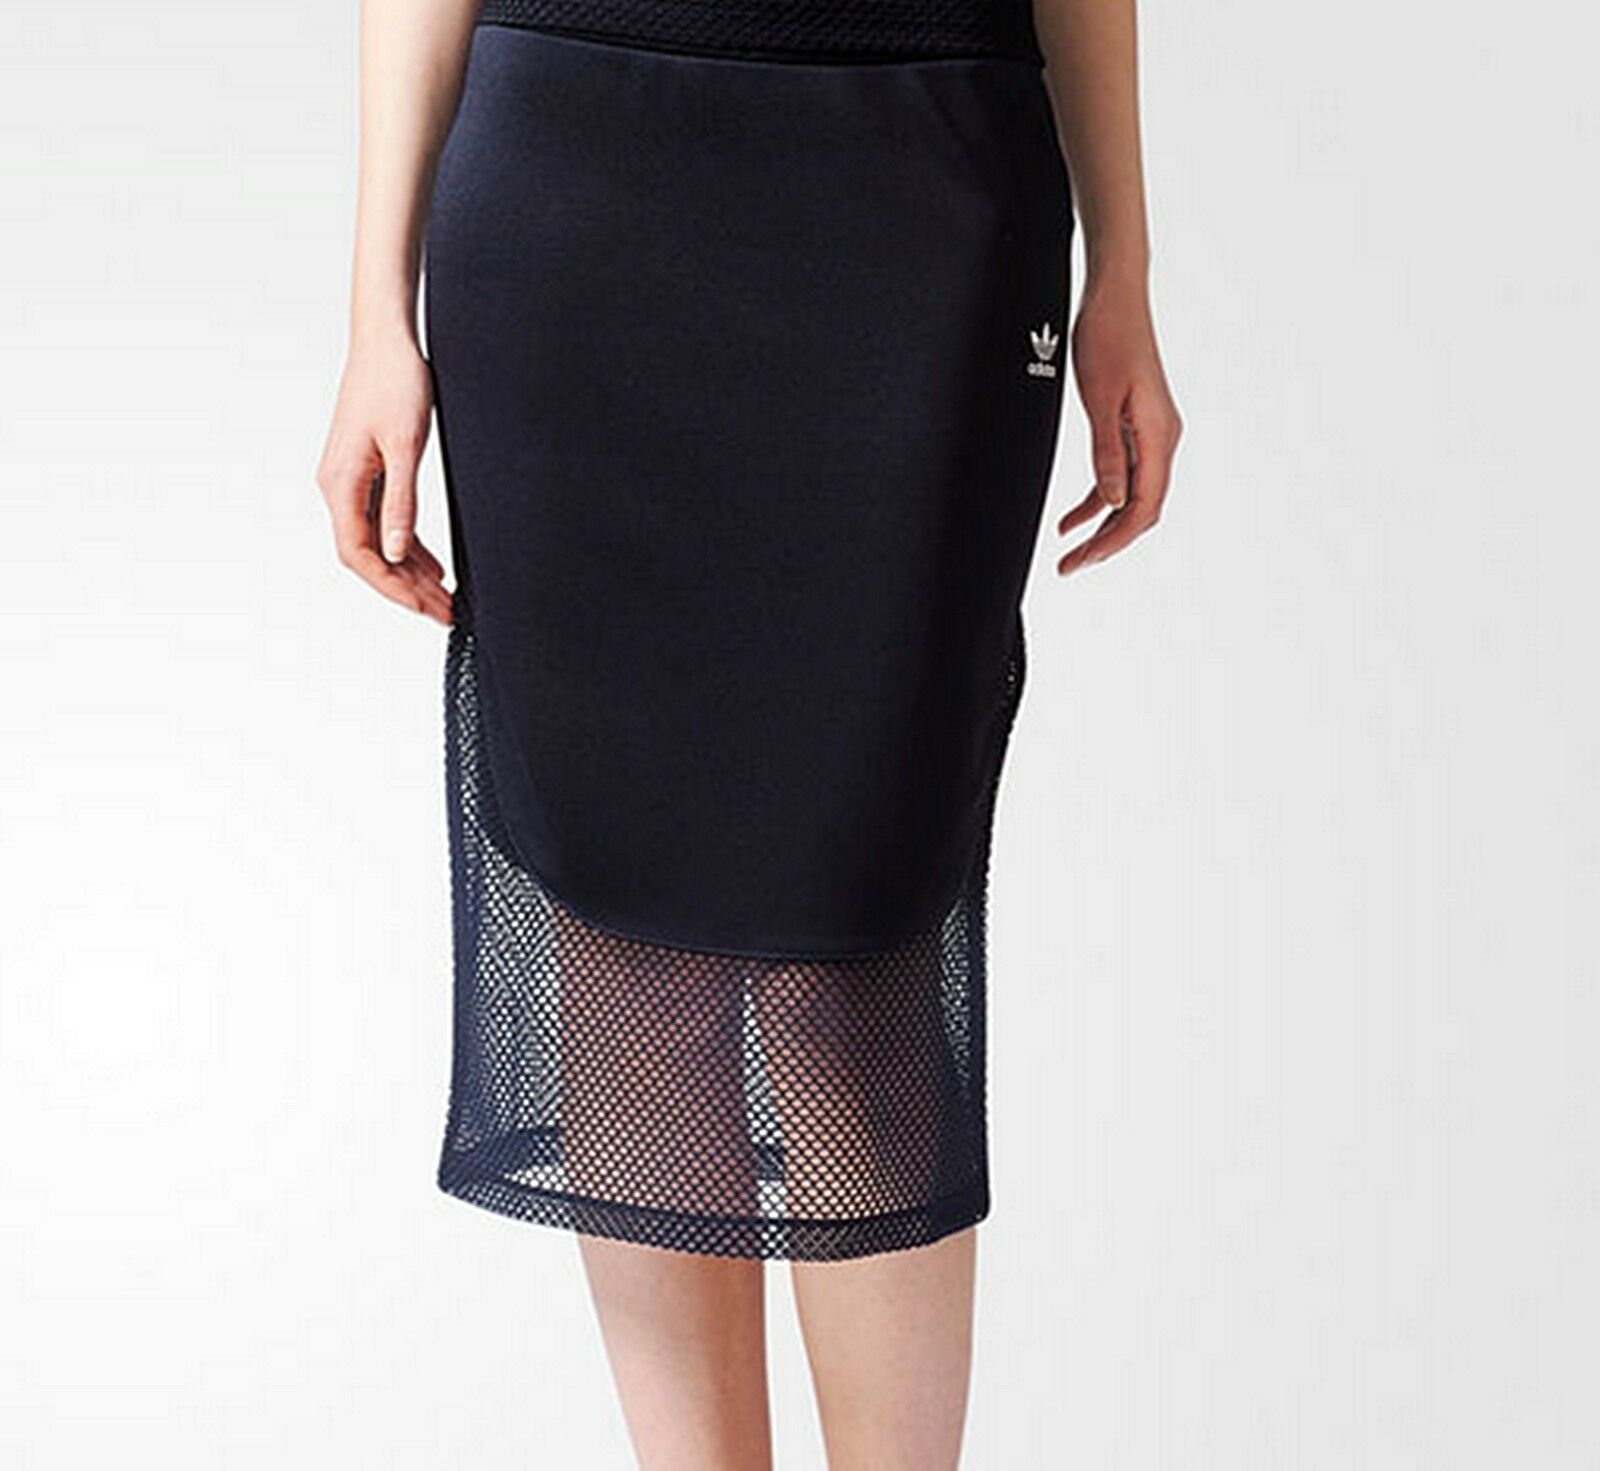 ADIDAS Originals Womens OSAKA Midi Skirt Navy bluee Mesh slim fit trefoil